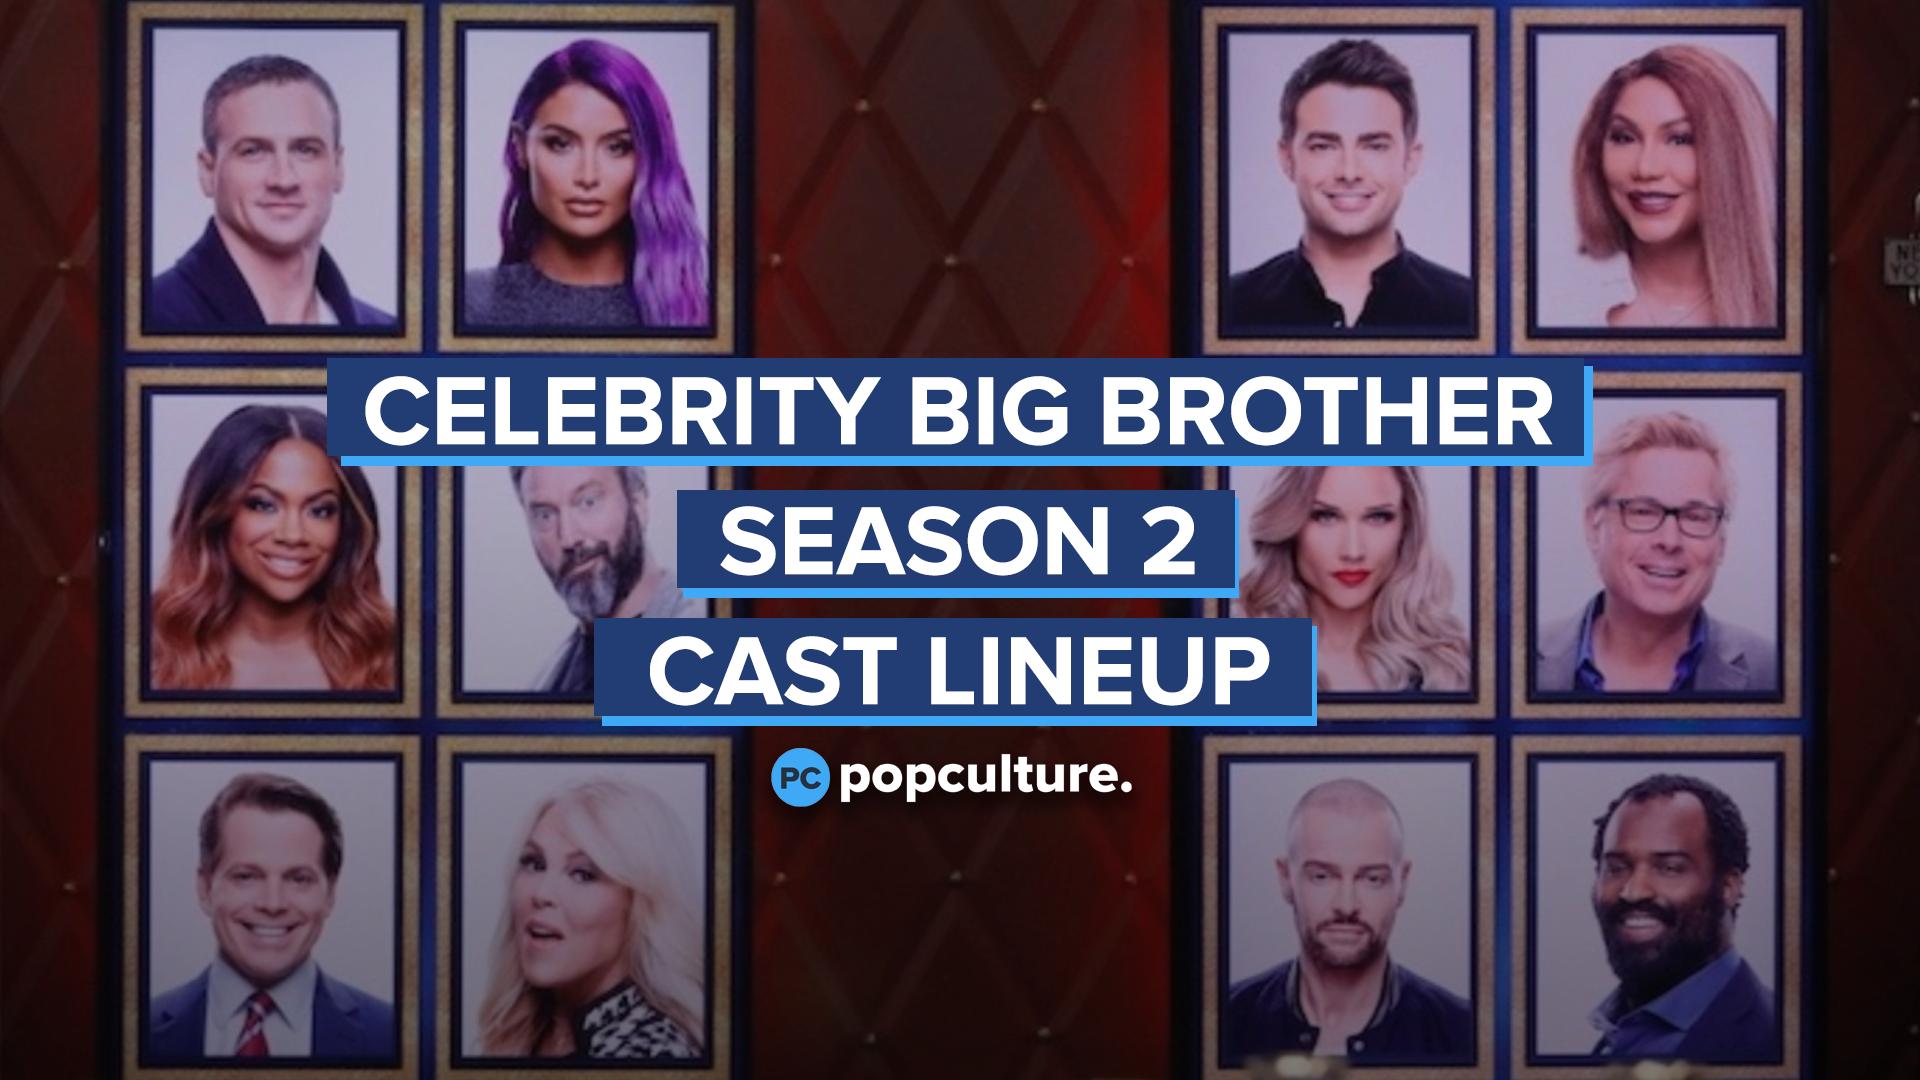 'Celebrity Big Brother' - 2019 Cast Lineup screen capture